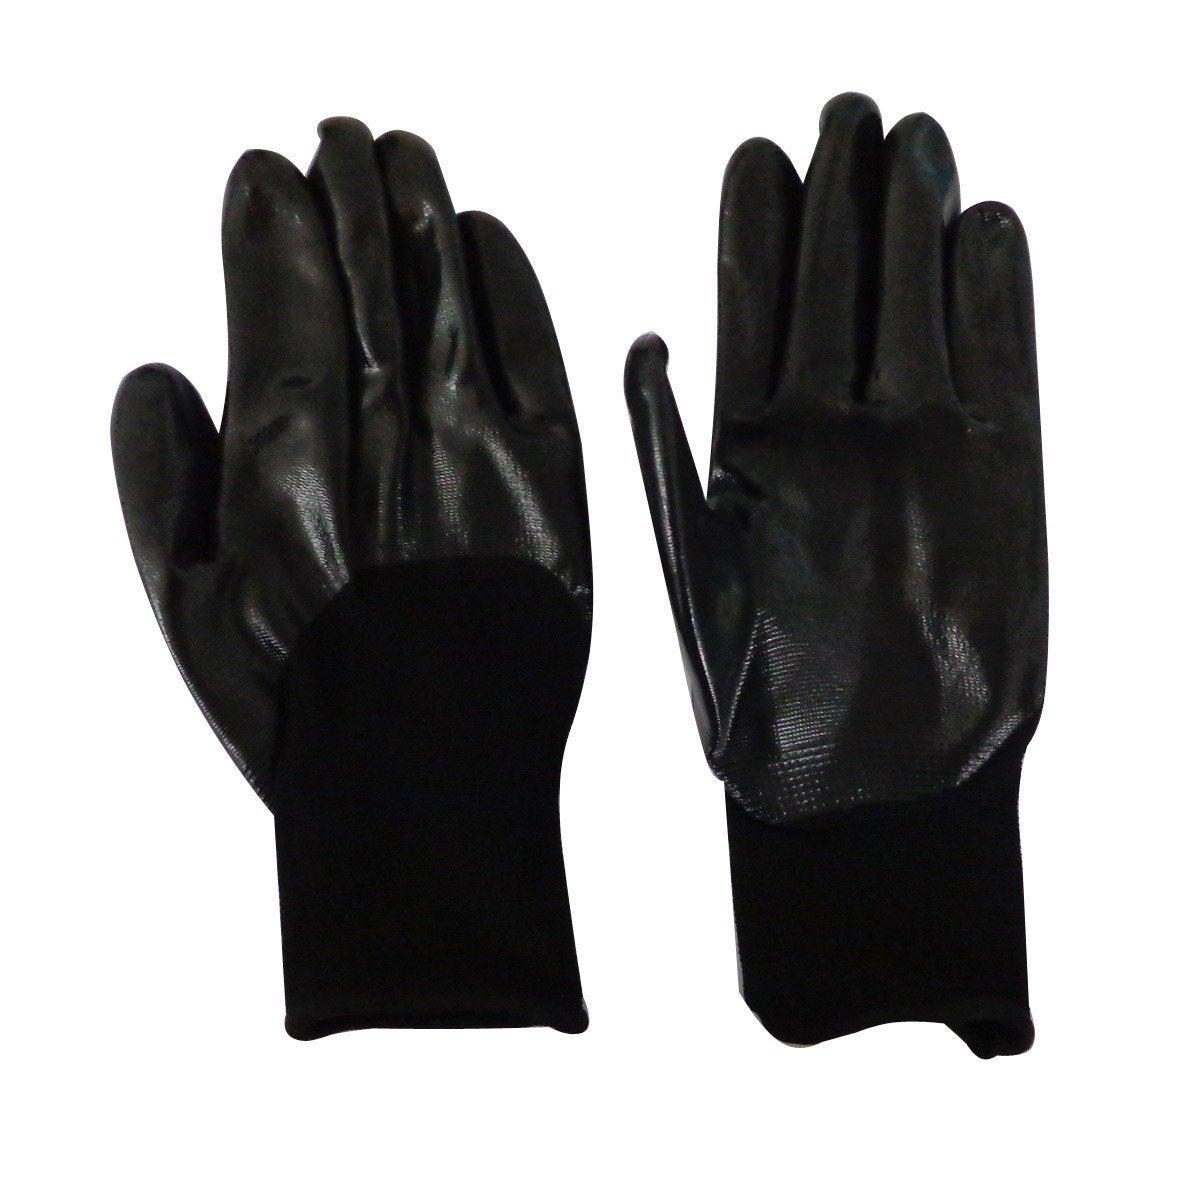 gants de carreleur dexter taille 8 m leroy merlin. Black Bedroom Furniture Sets. Home Design Ideas